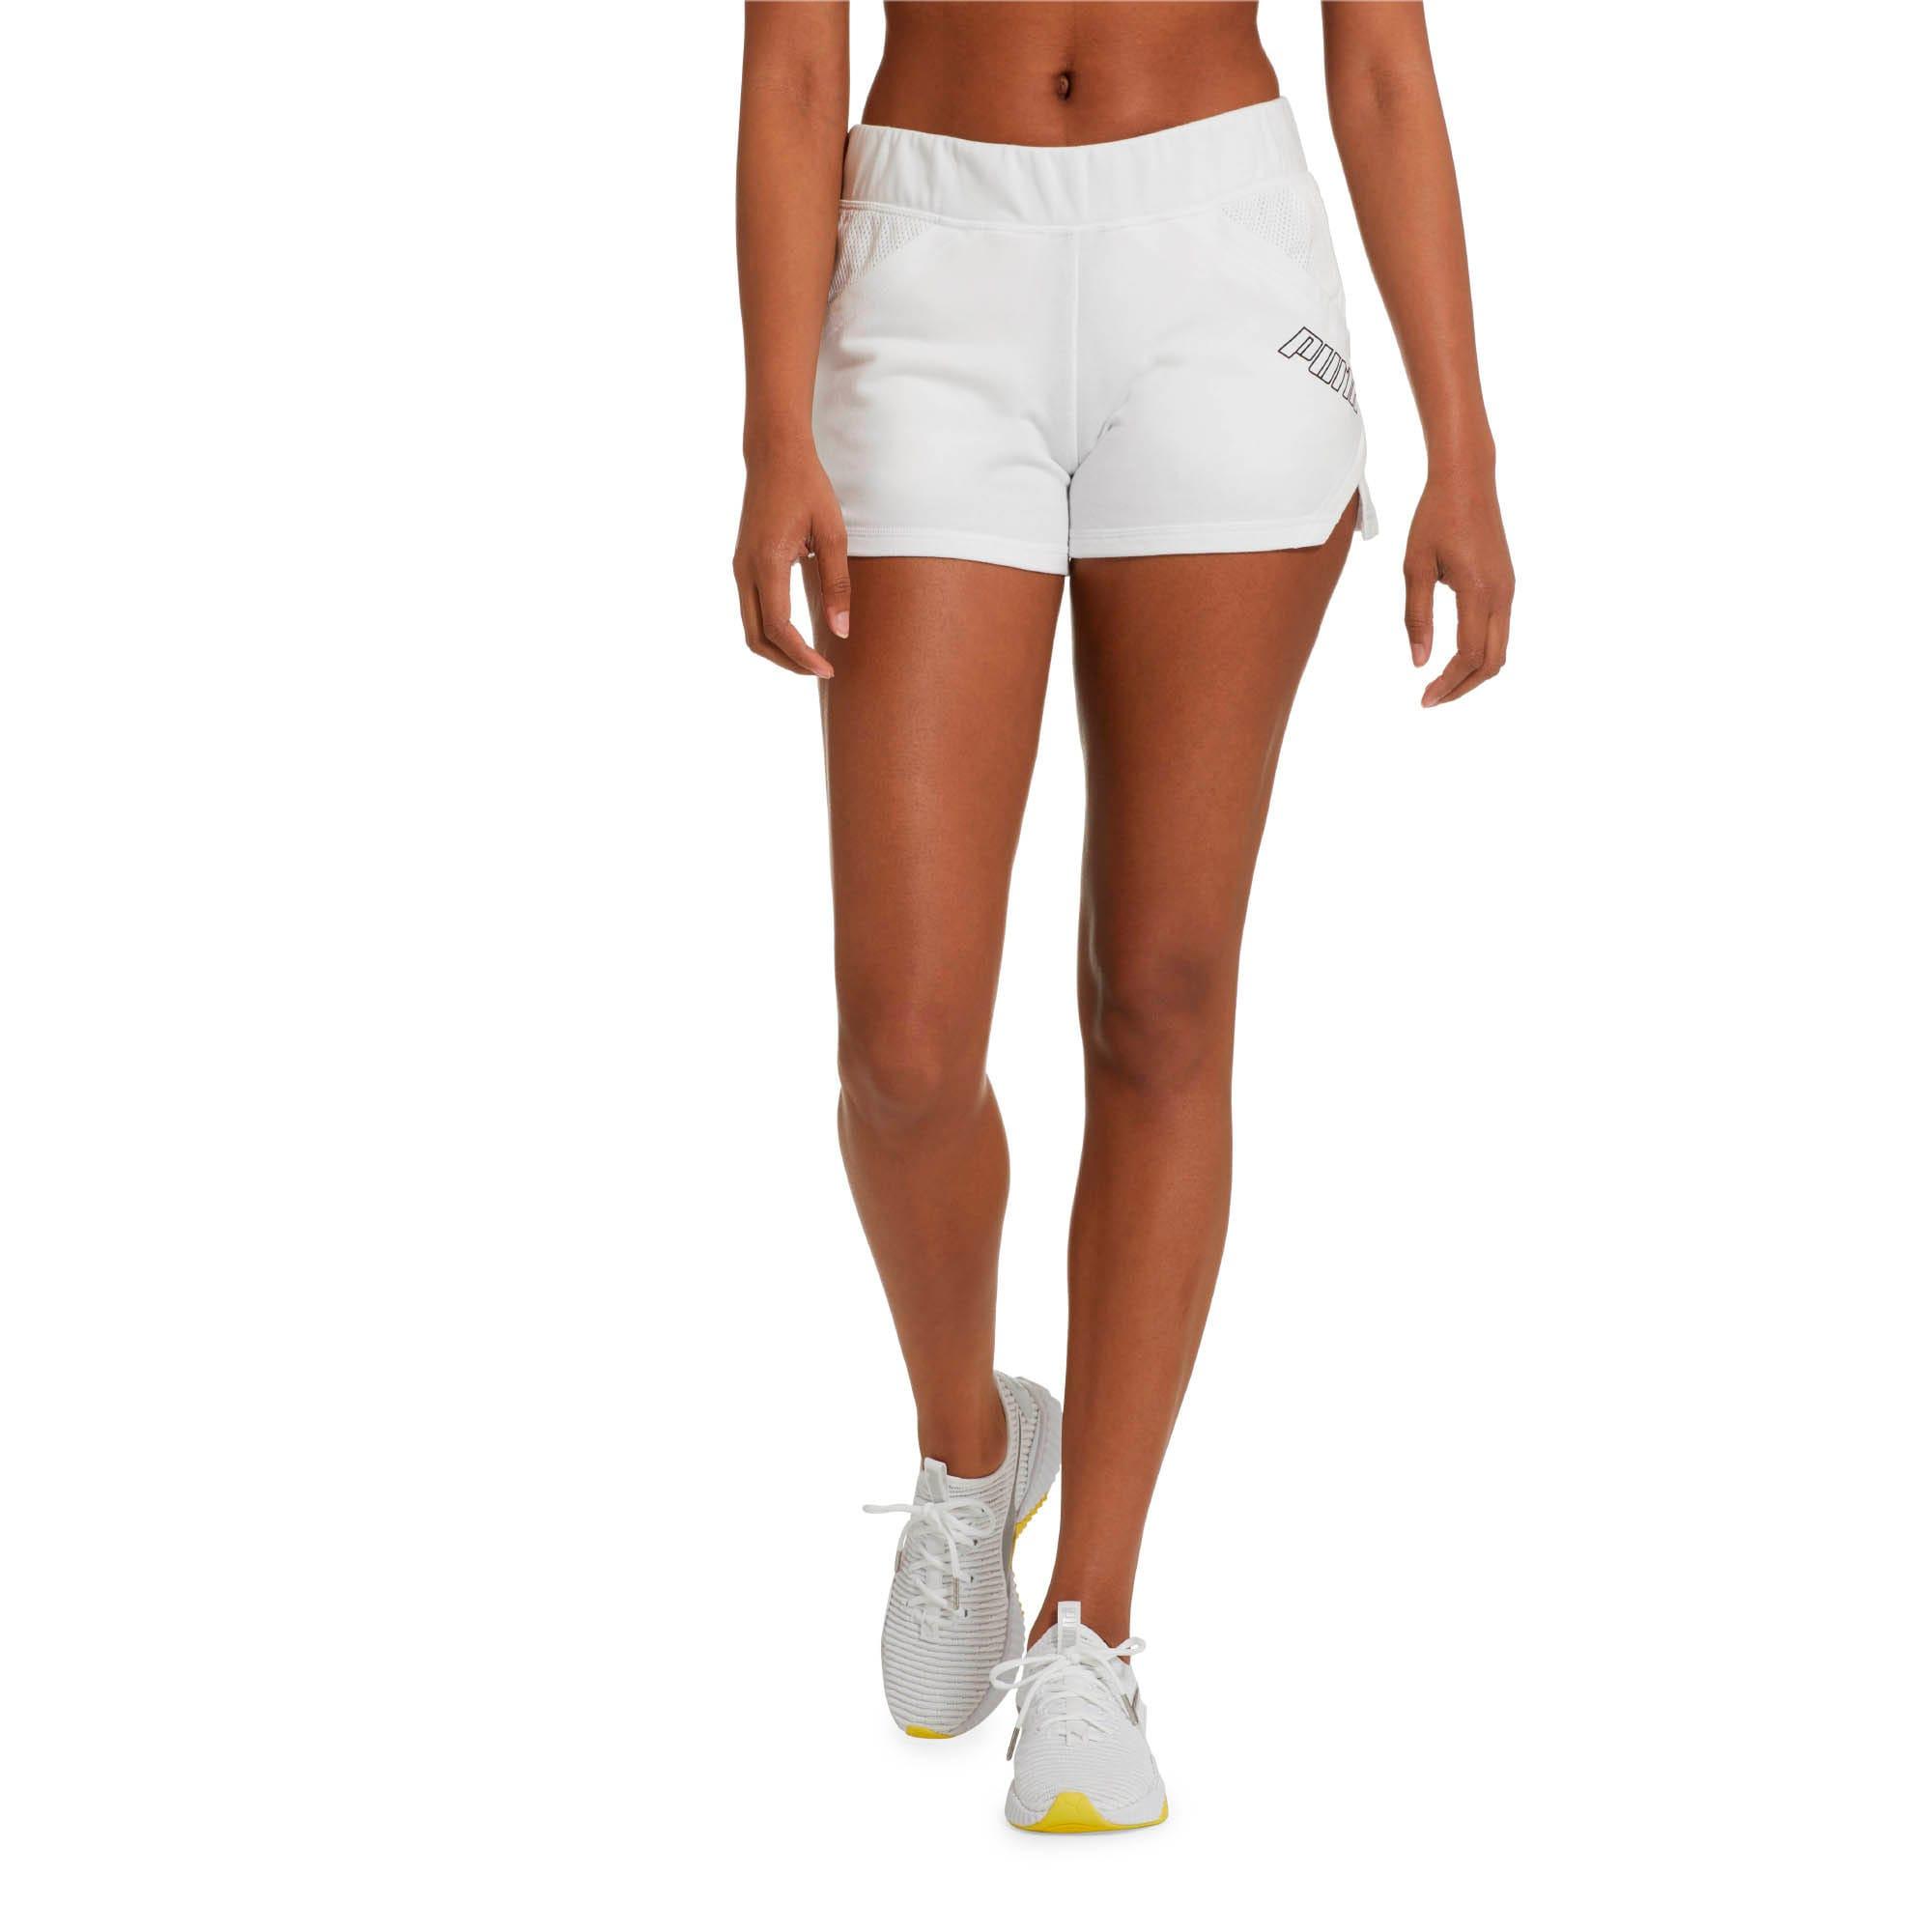 "Thumbnail 2 of Yogini Women's 3"" Shorts, Puma White, medium"